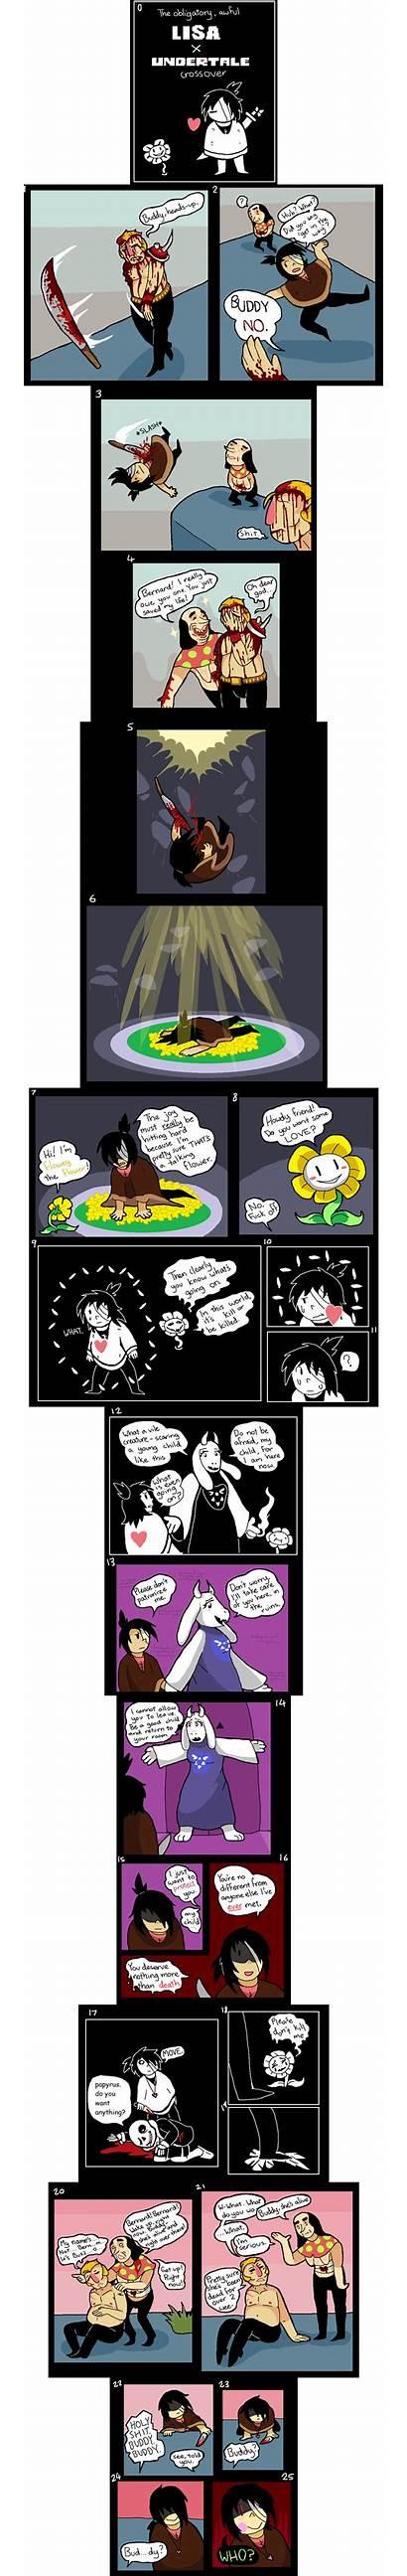 Undertale Lisa Crossover Awful Obligatory Meme Random